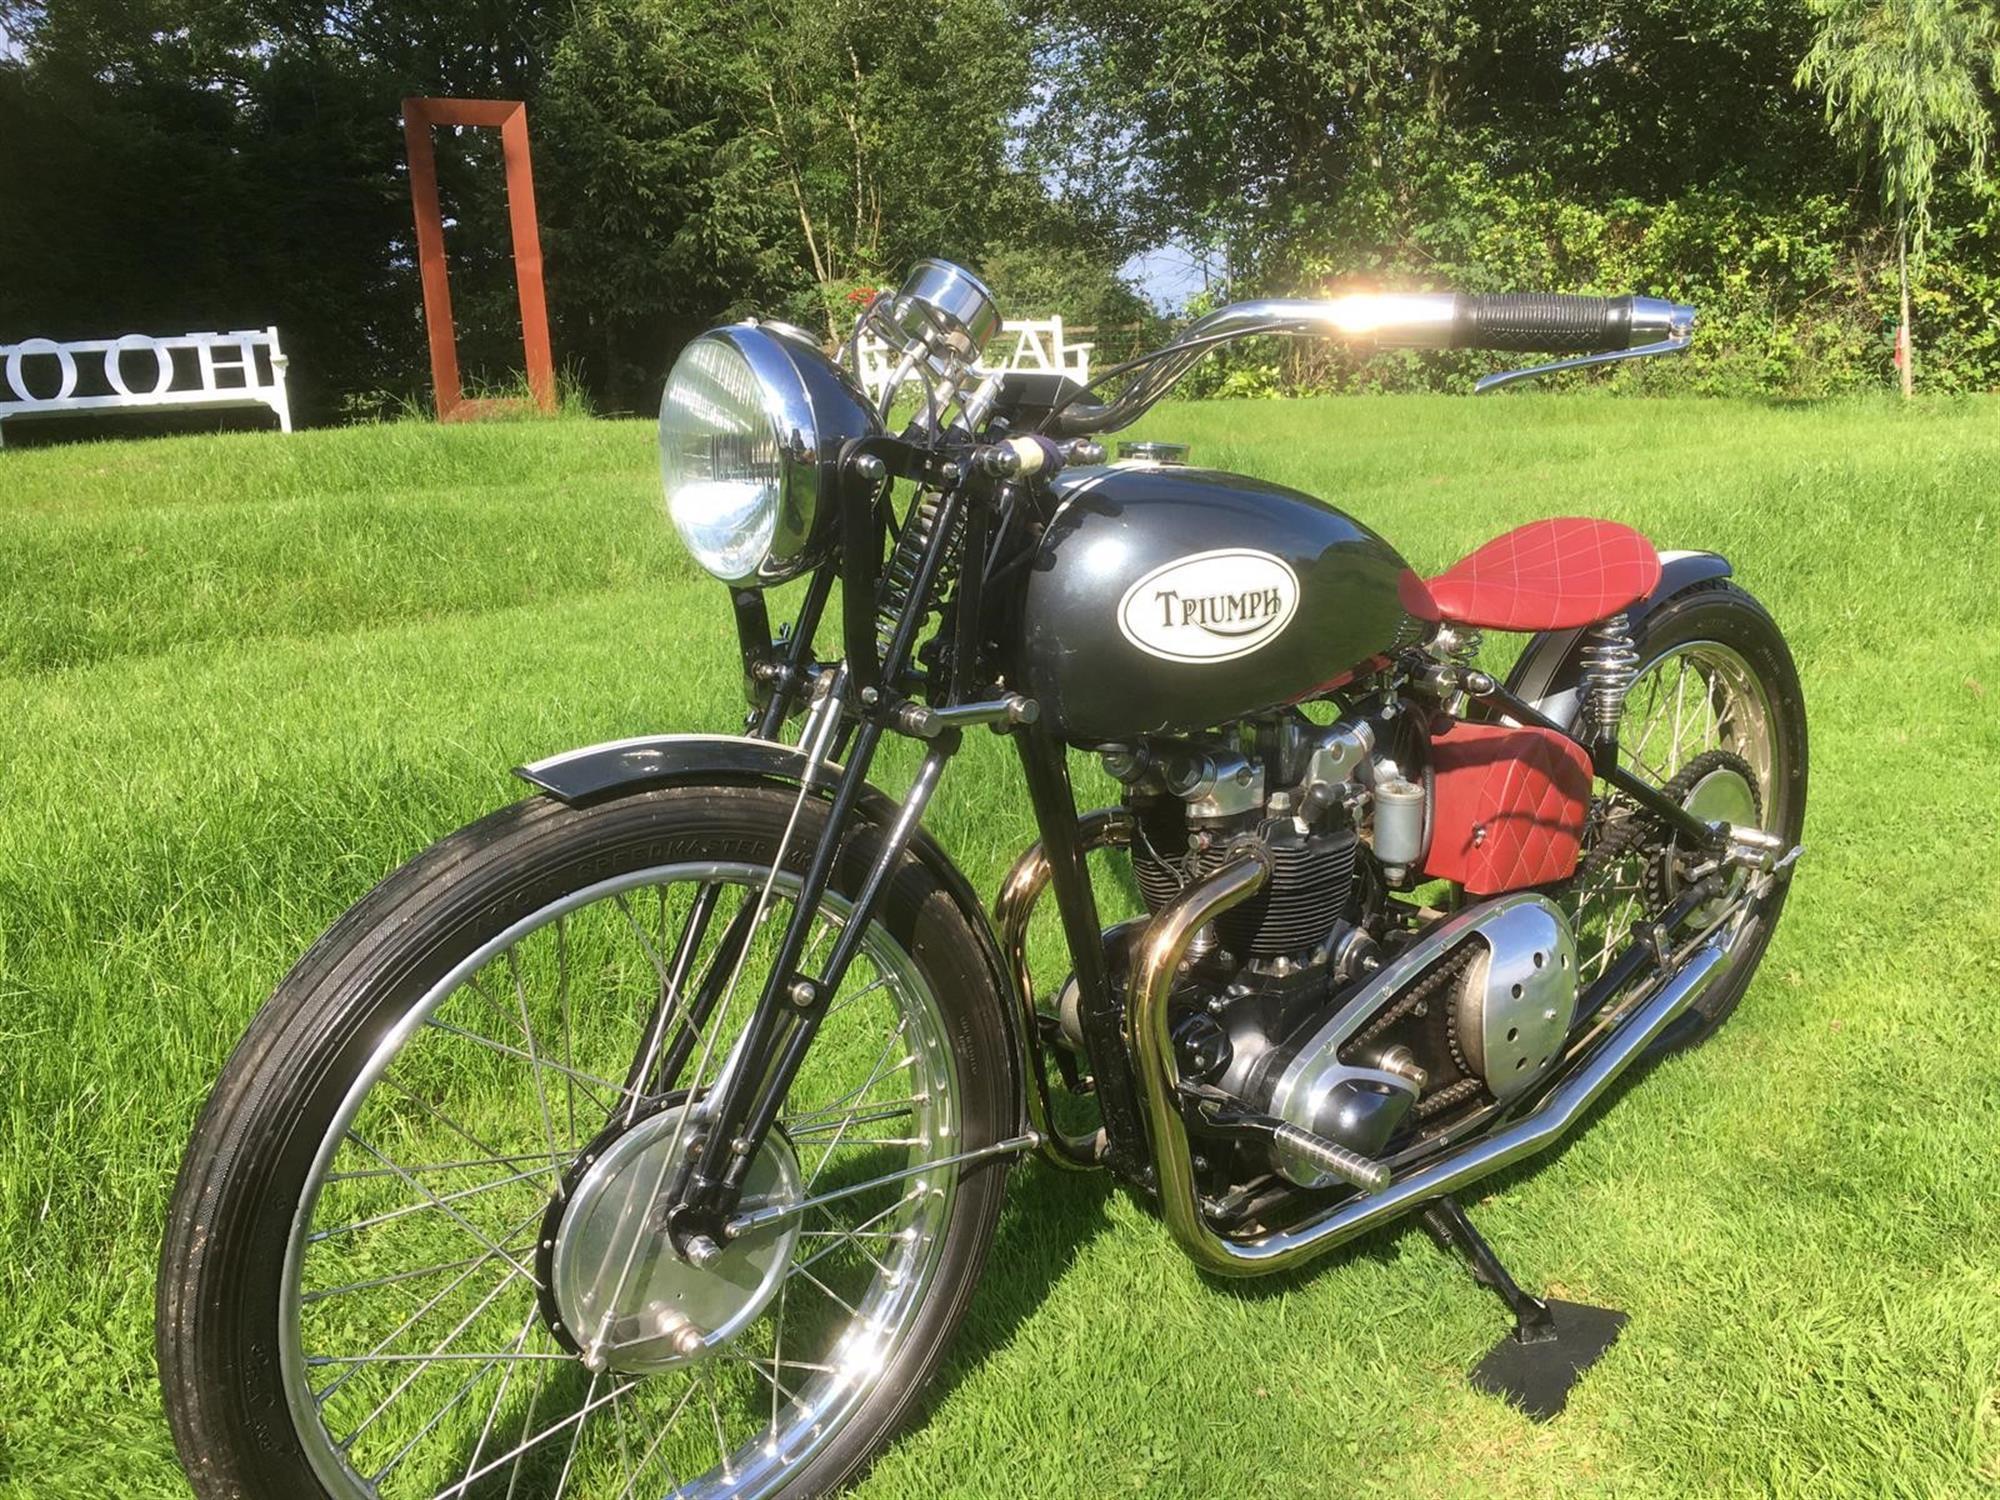 1952 Purdy Triumph 500 - Image 10 of 10